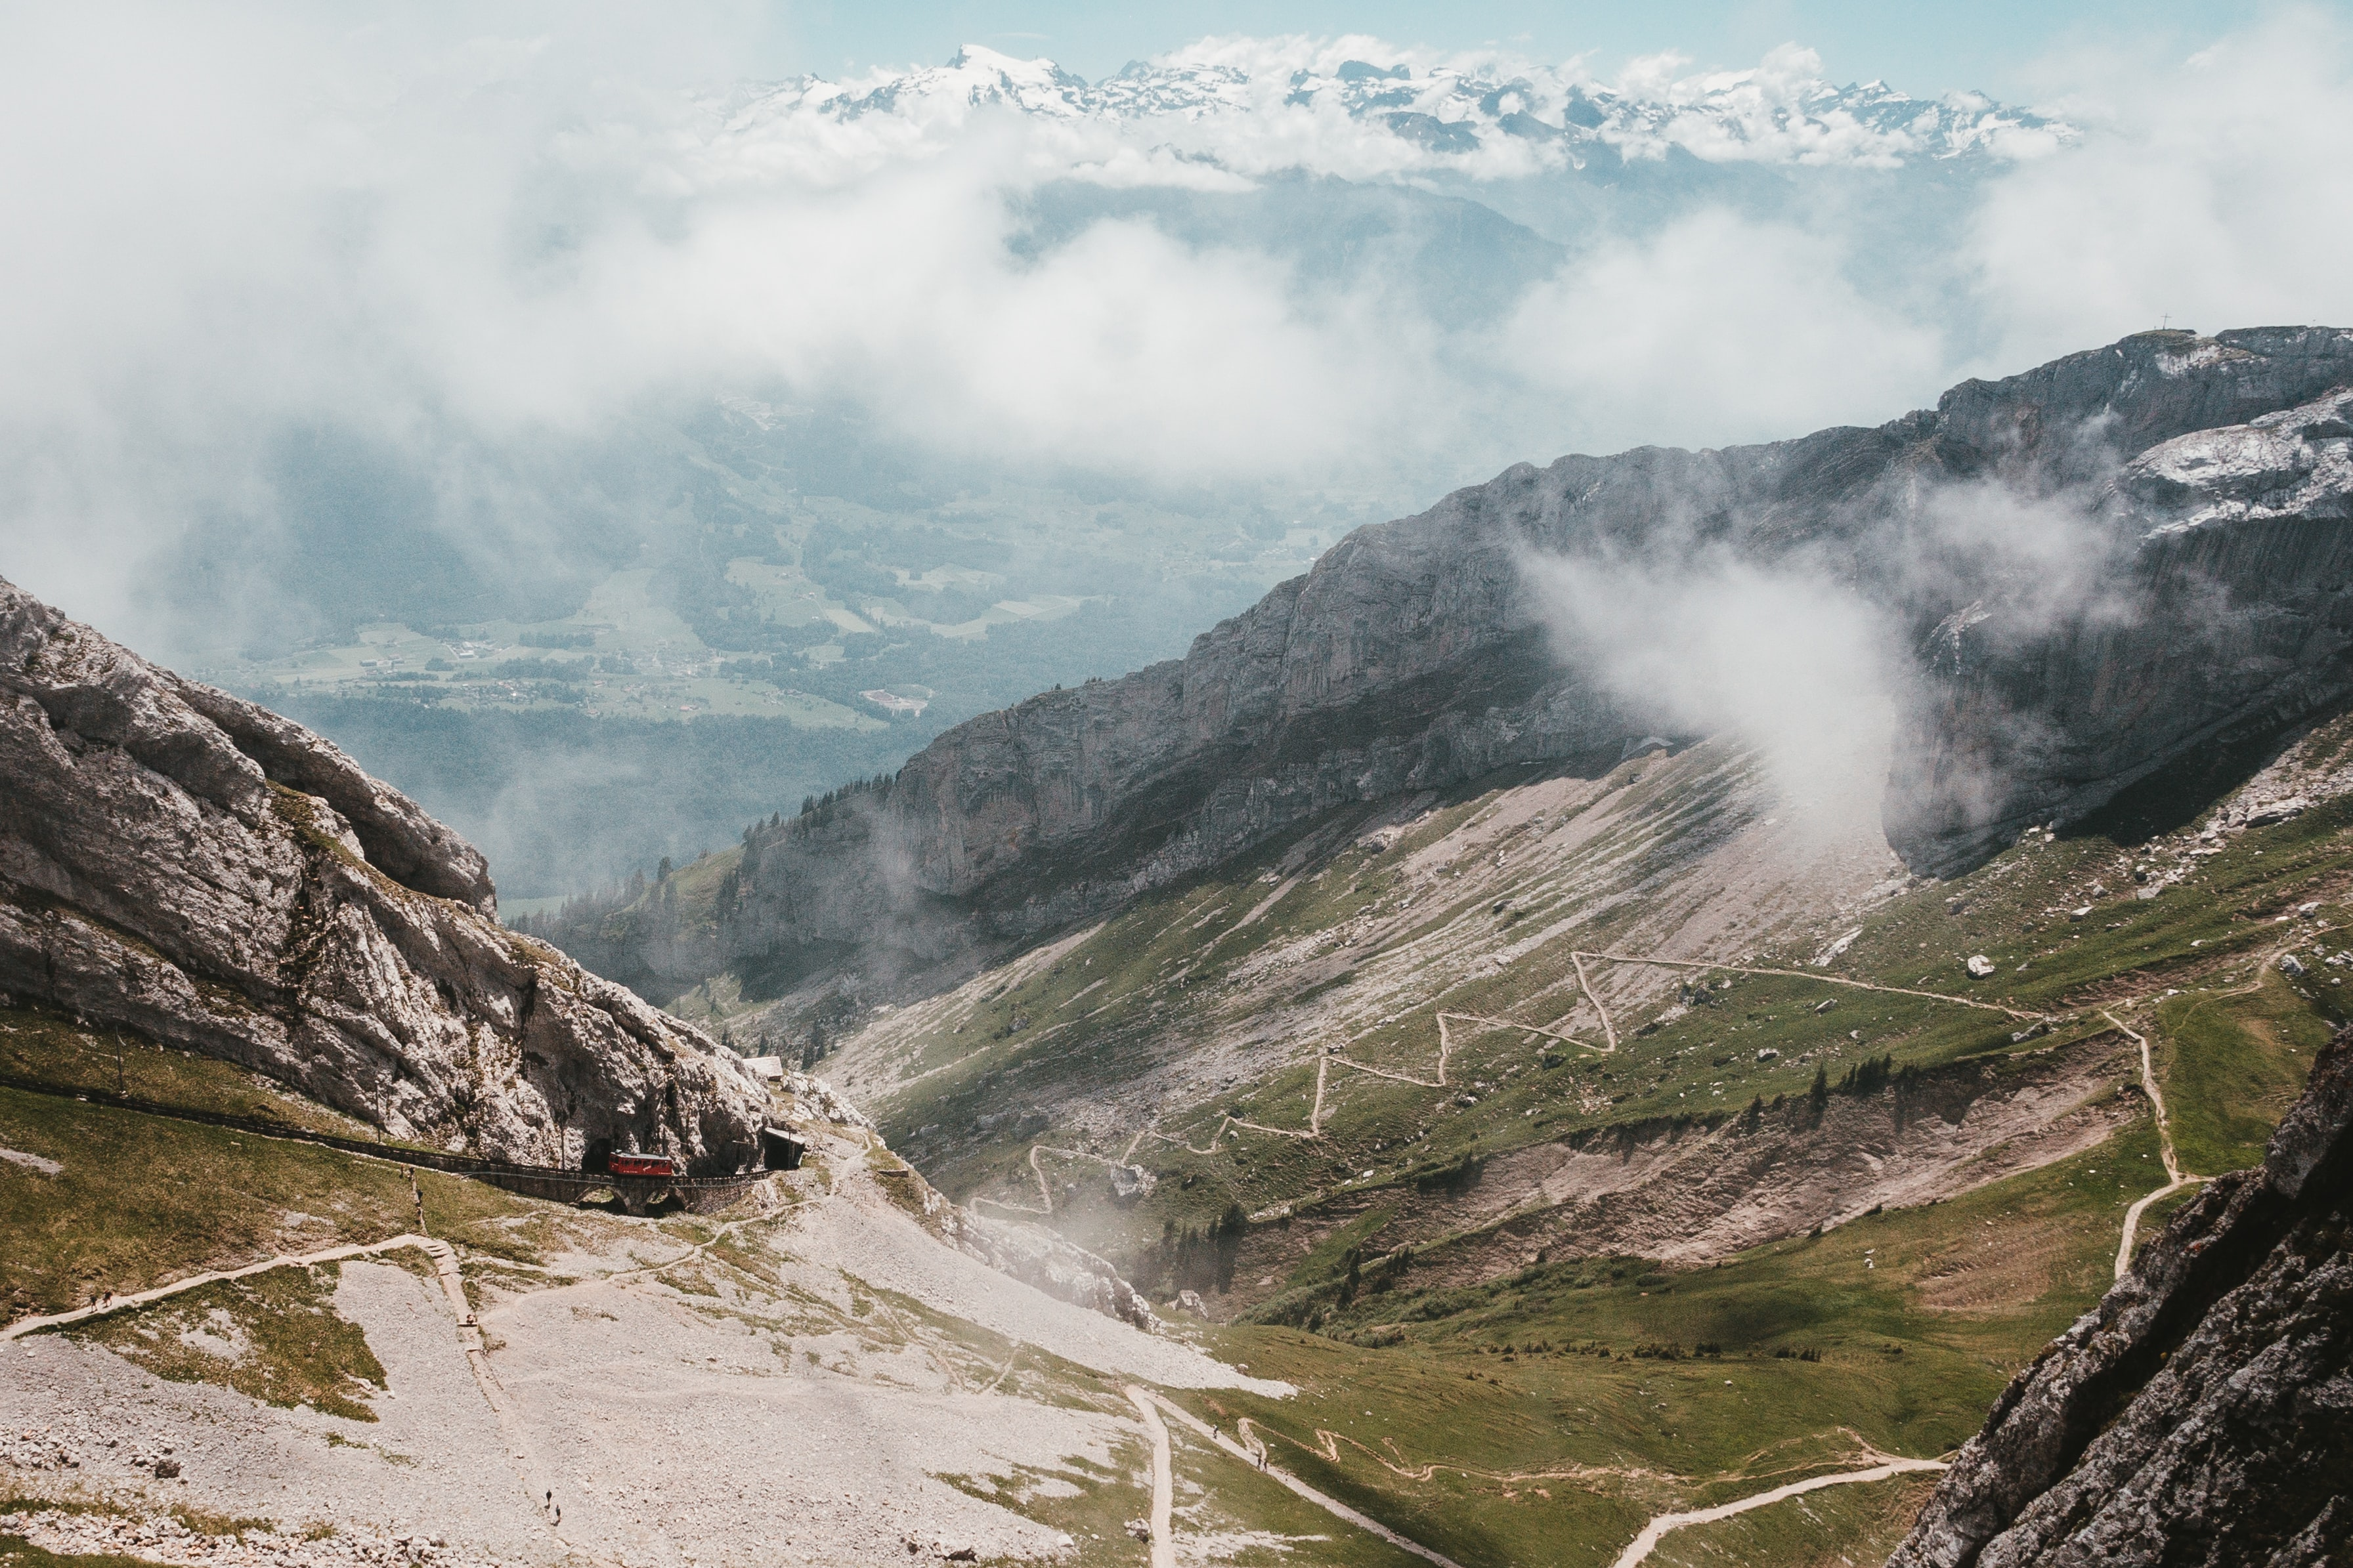 cogwheel, most scenic train journeys to take in Switzerland